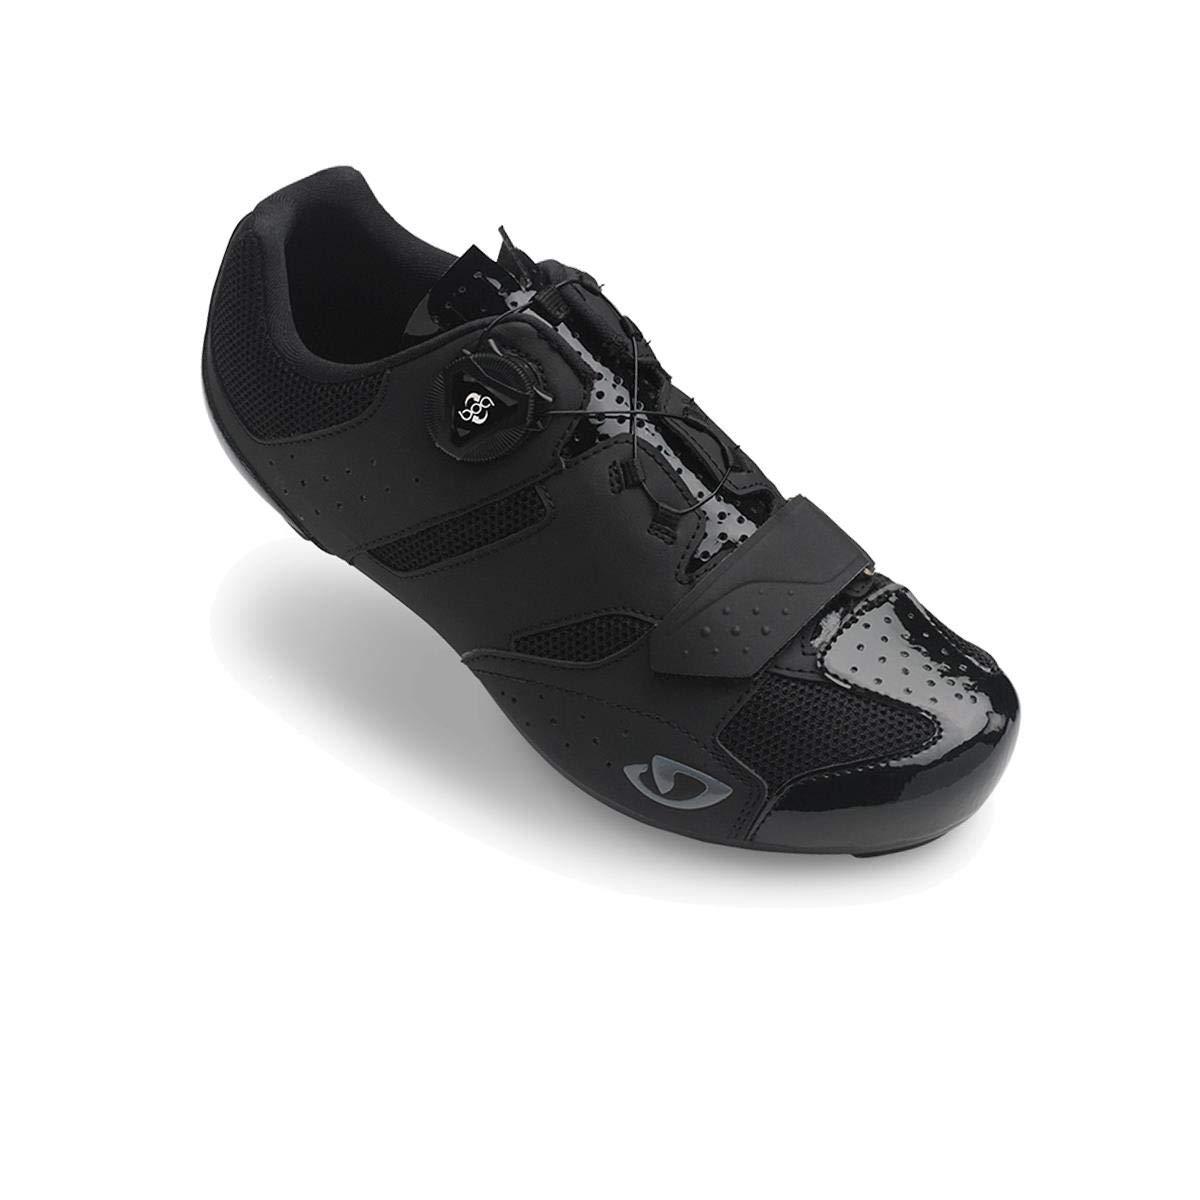 Giro savix HV +サイクリング靴 – Men 's 46 M EU ブラック B075RX6N9D